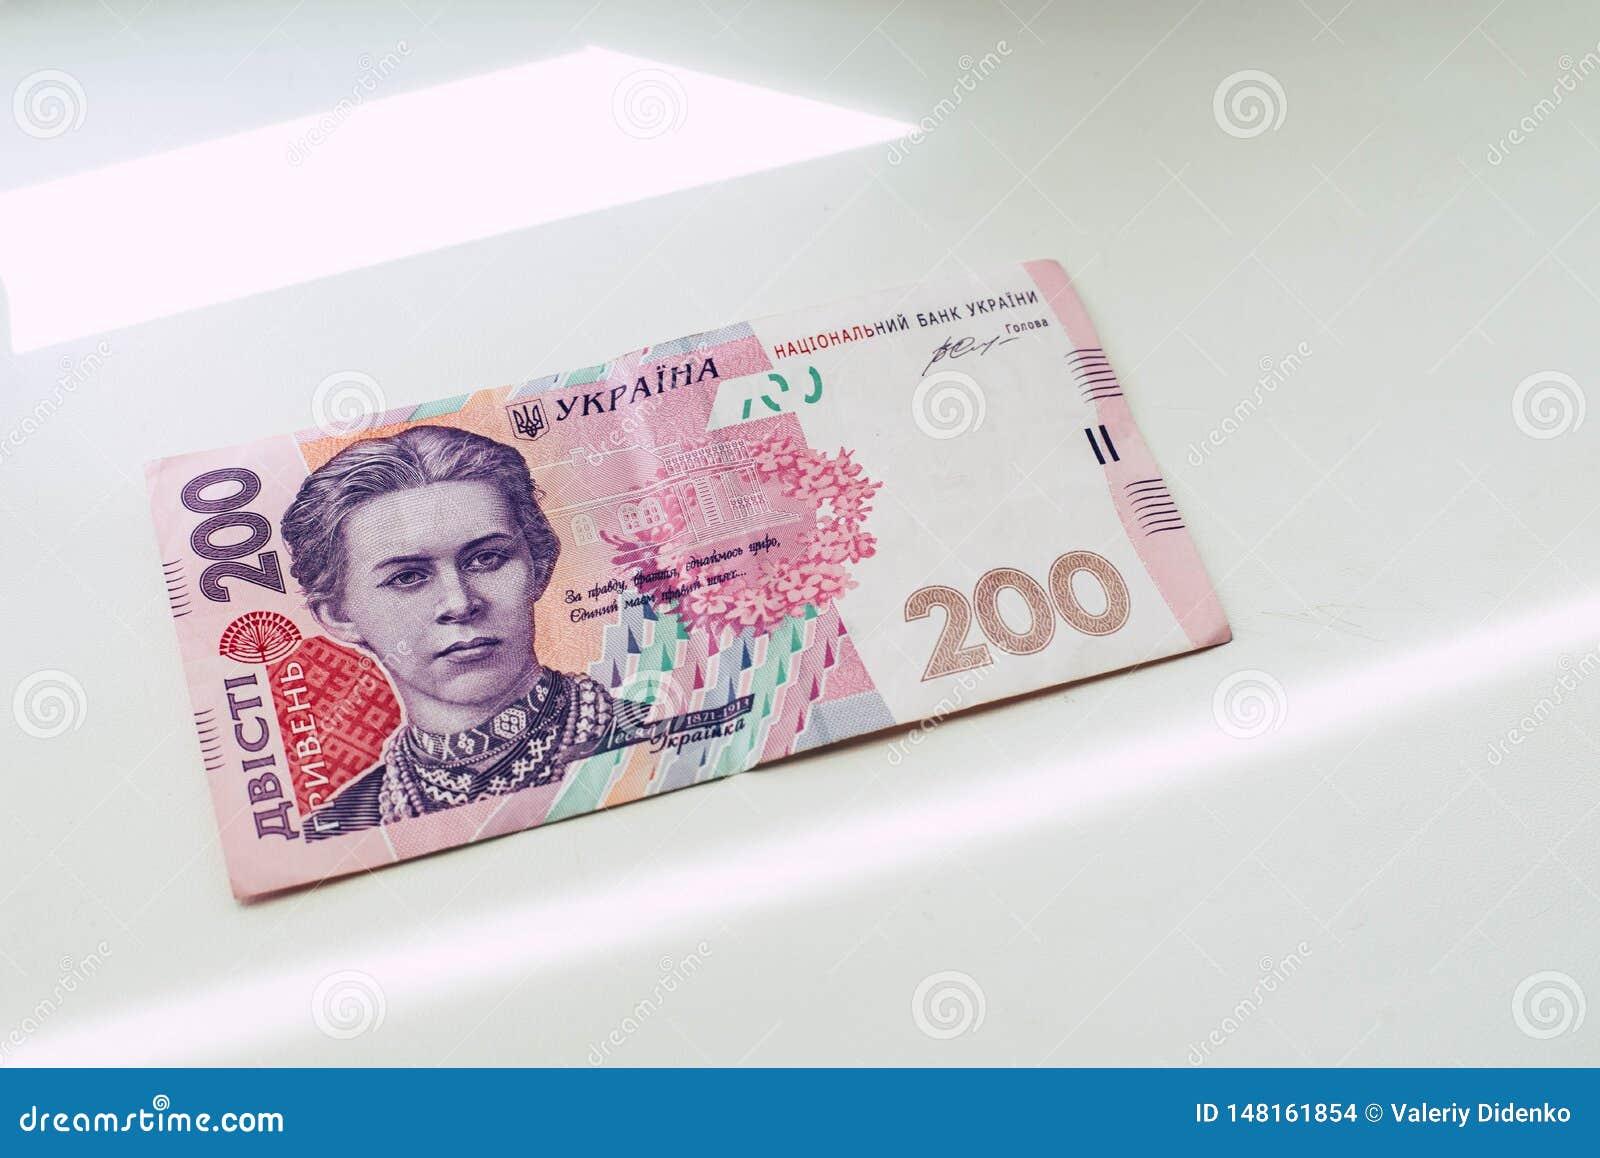 Banknot w 200 Ukrai?skich hryvnias